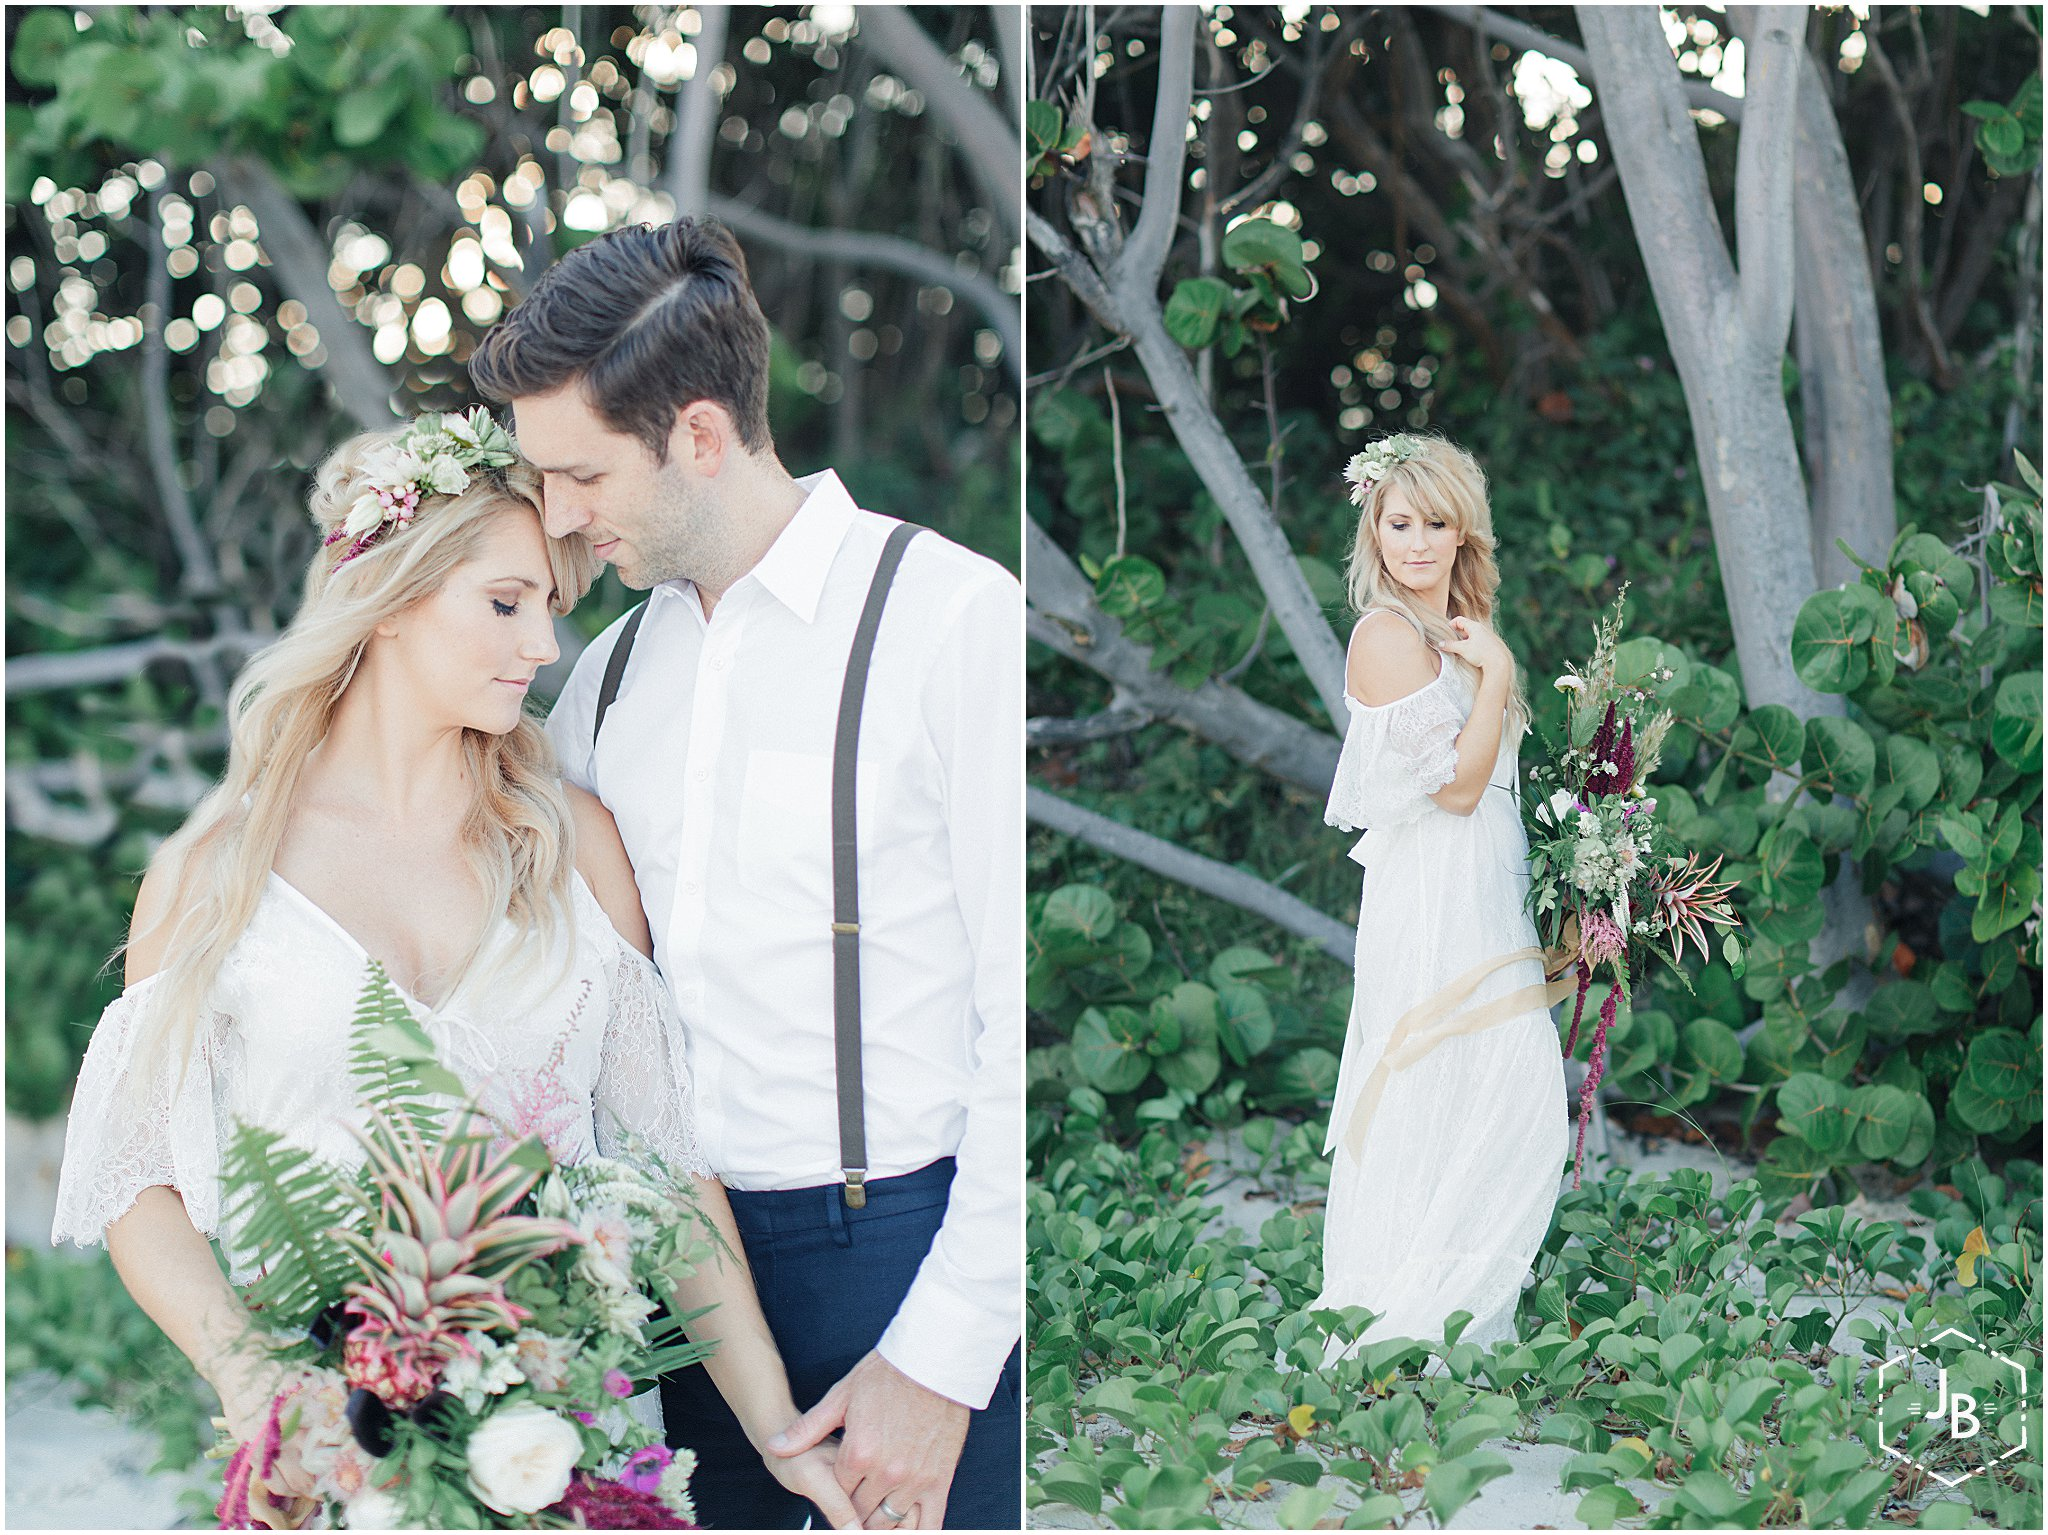 WeddingandEngagementFloridaPhotographer_1358.jpg